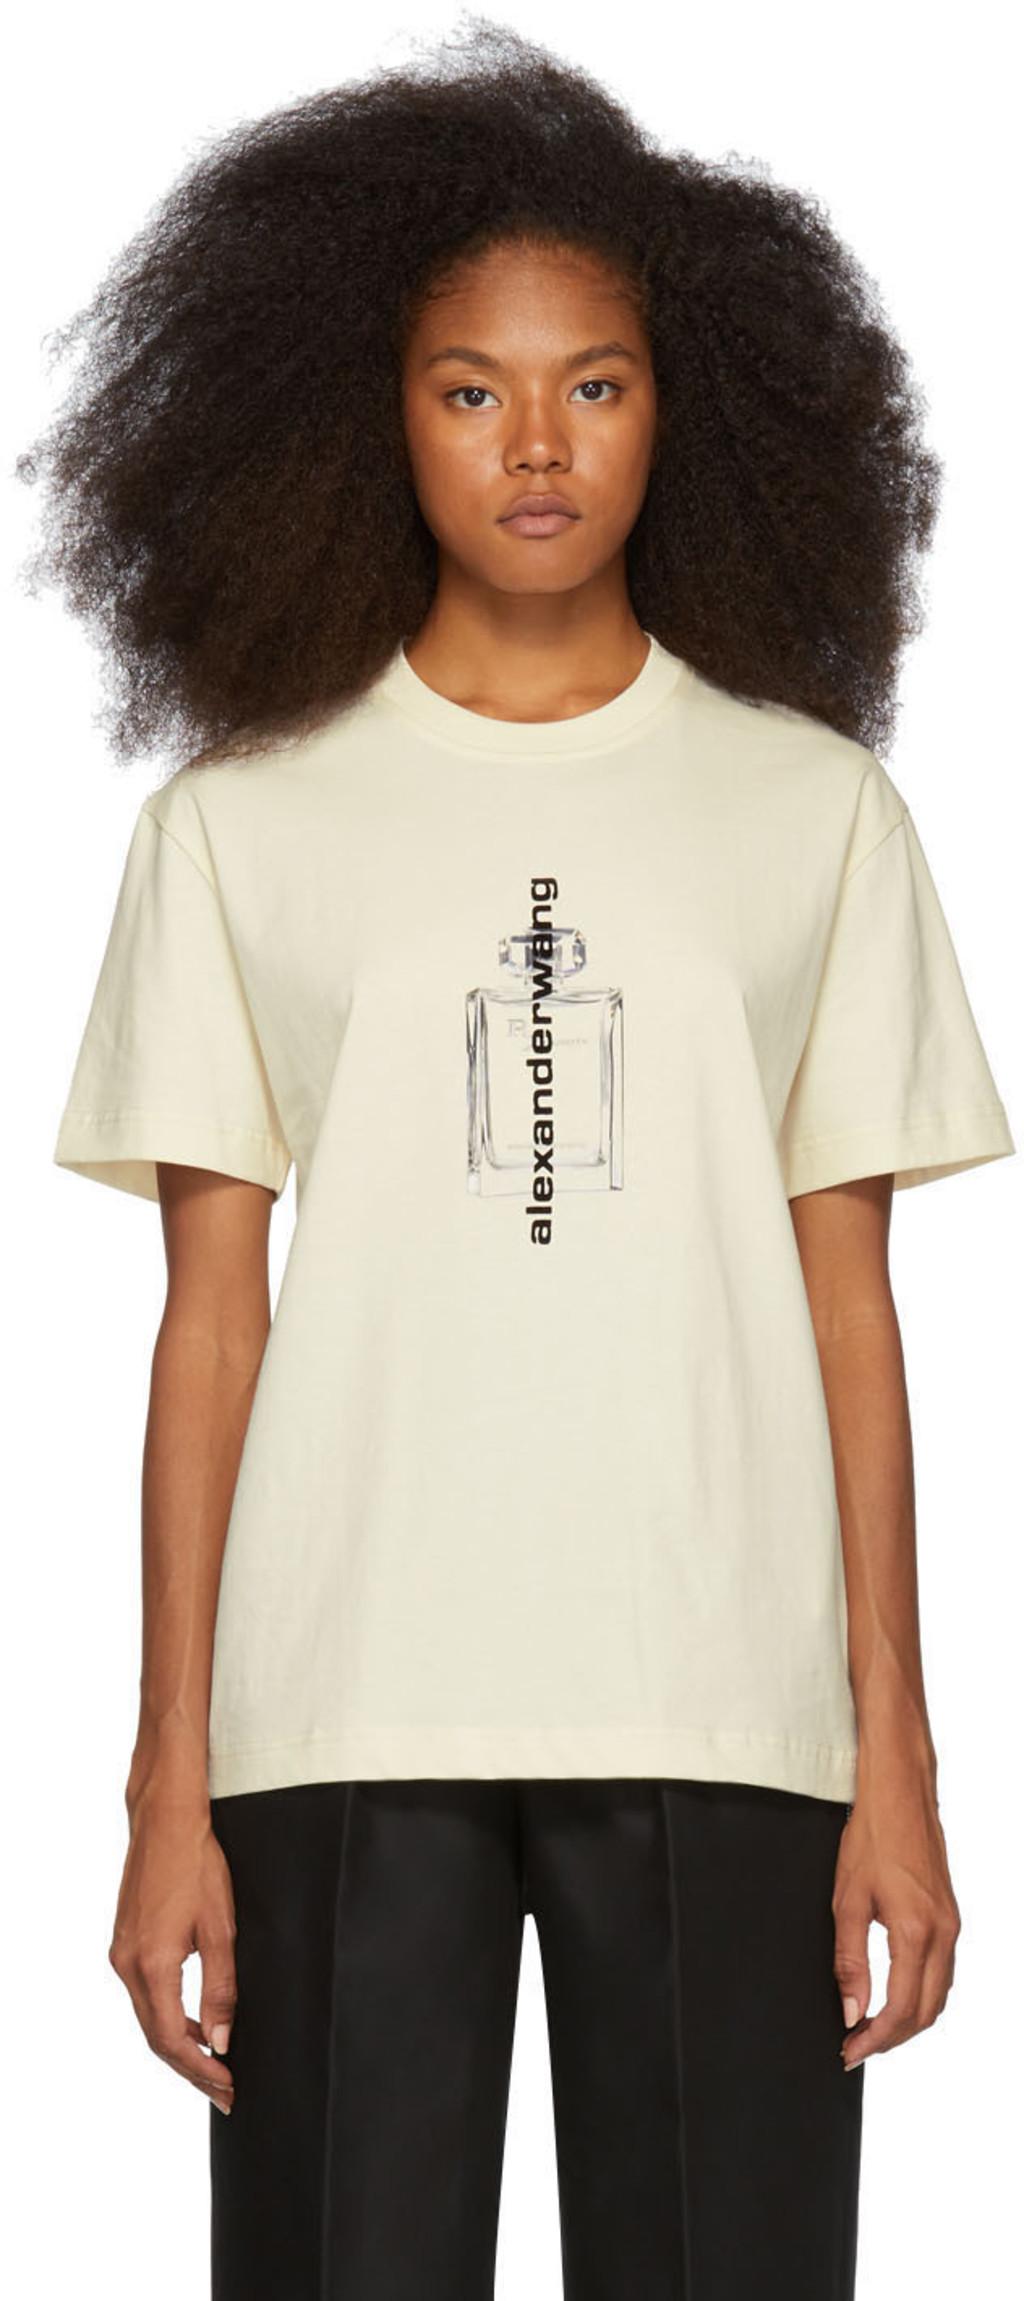 6f37dc077 Off-White Graphic T-Shirt